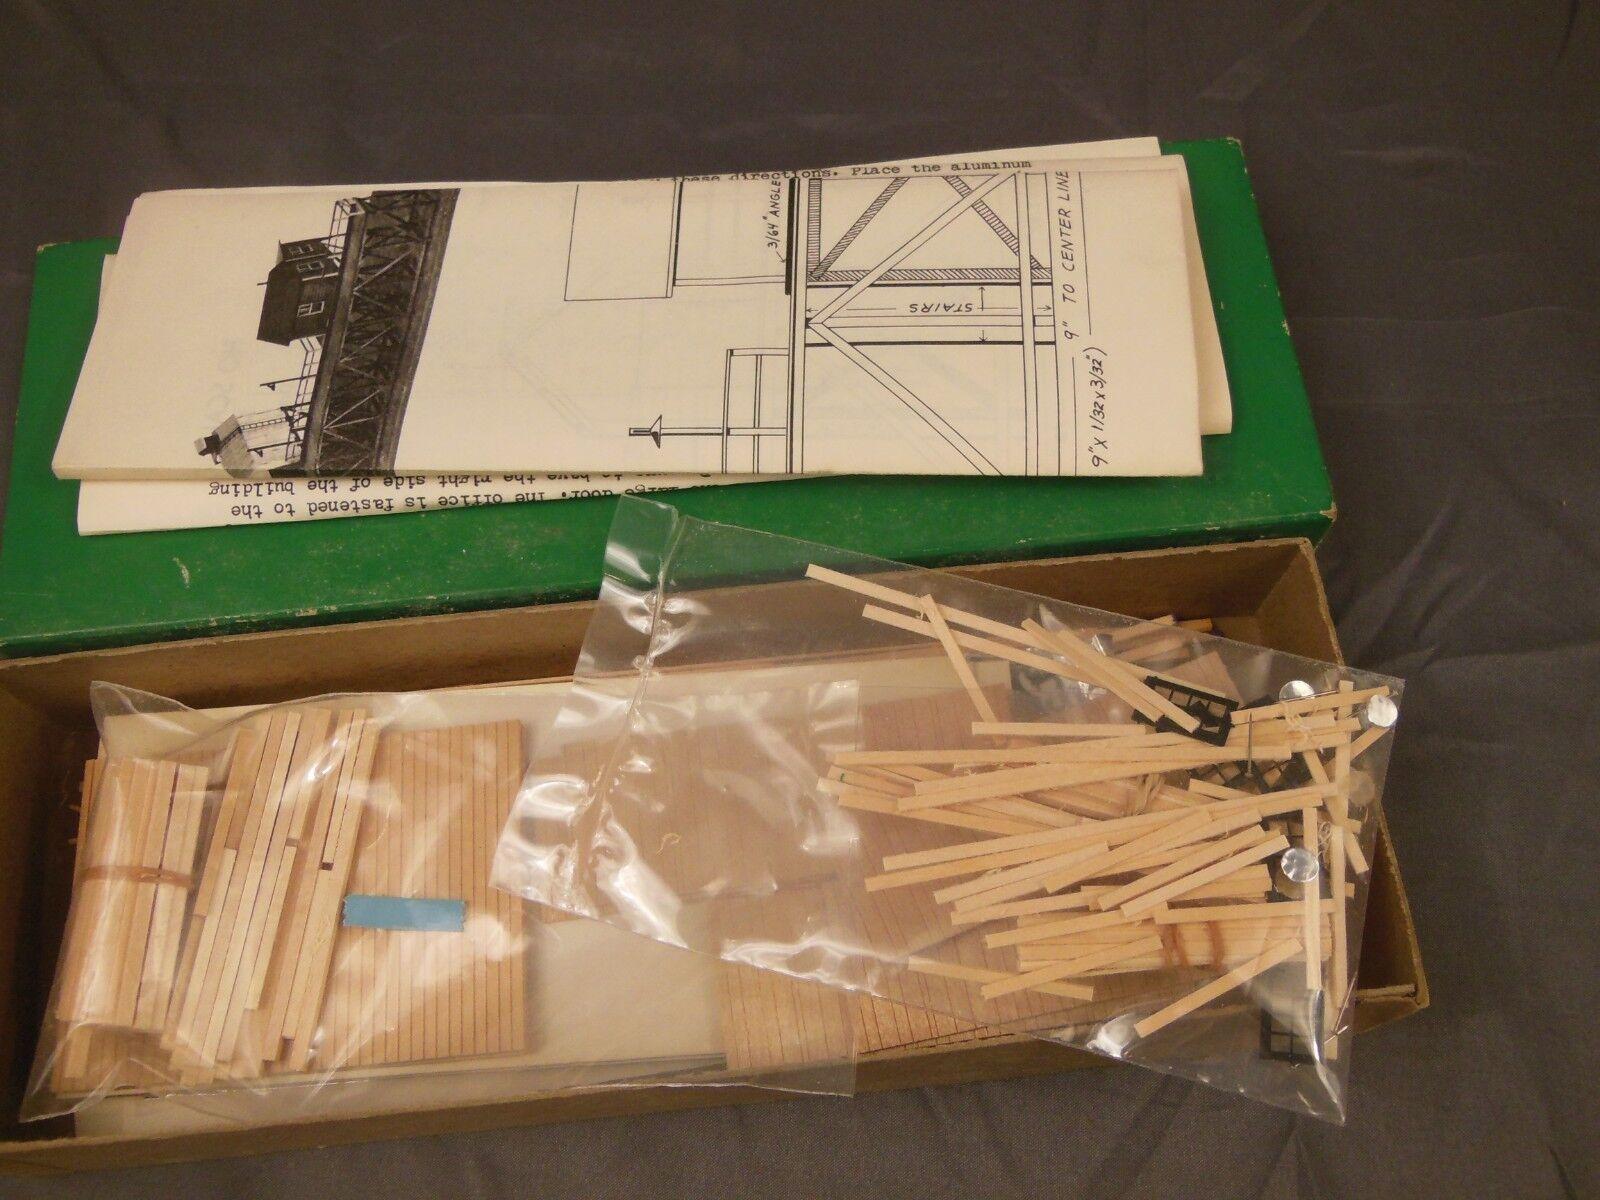 HO SCALE SUNCOAST MODELS 3020 ICING PLATFORM  18  LONG  CRAFTSMAN STRUCTURE KIT